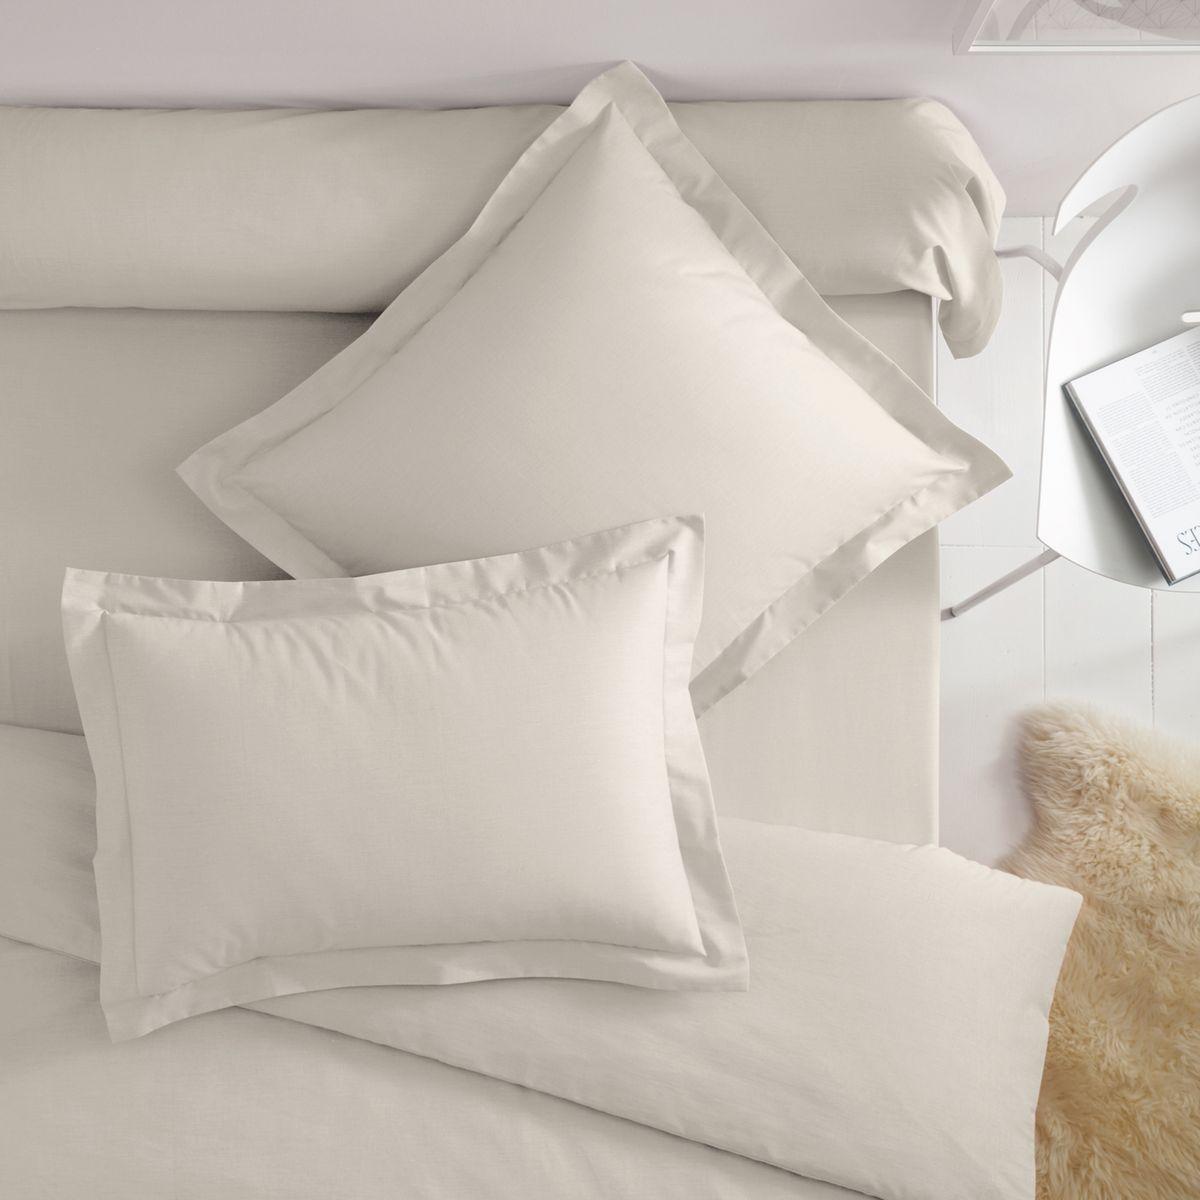 Taies d'oreiller polyester/coton(polycoton) à vola